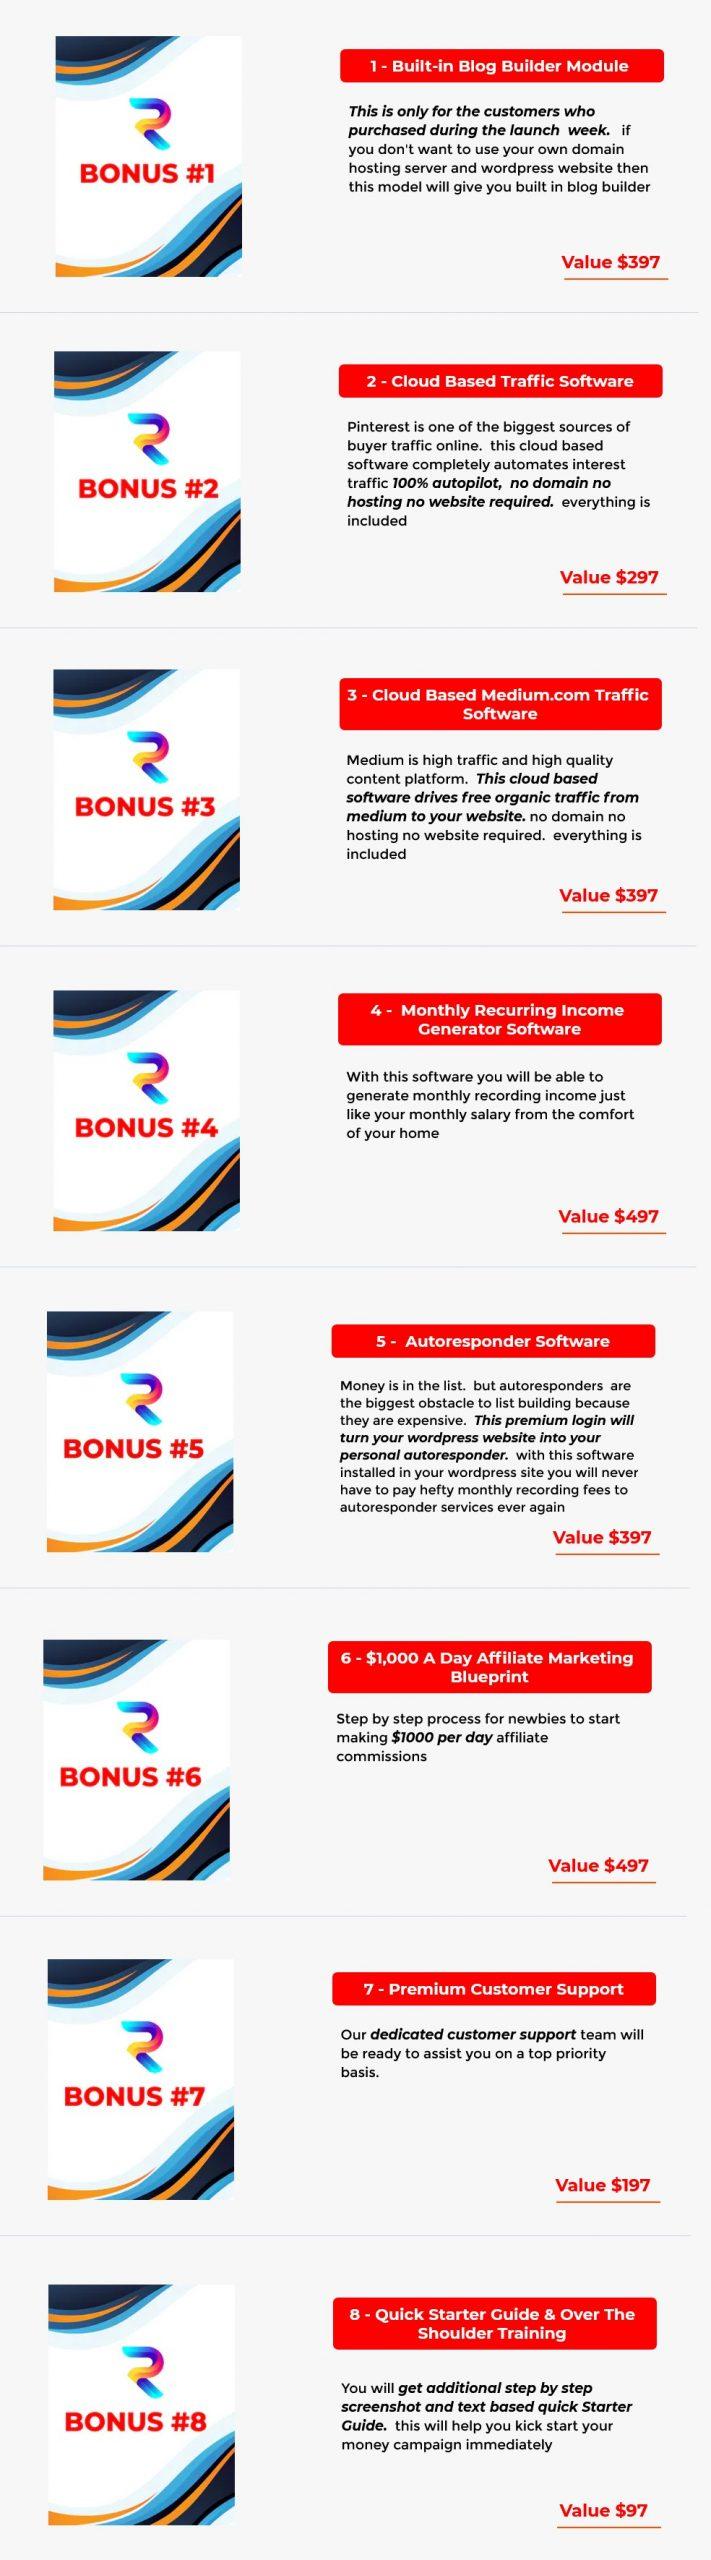 ReZolved-bonus